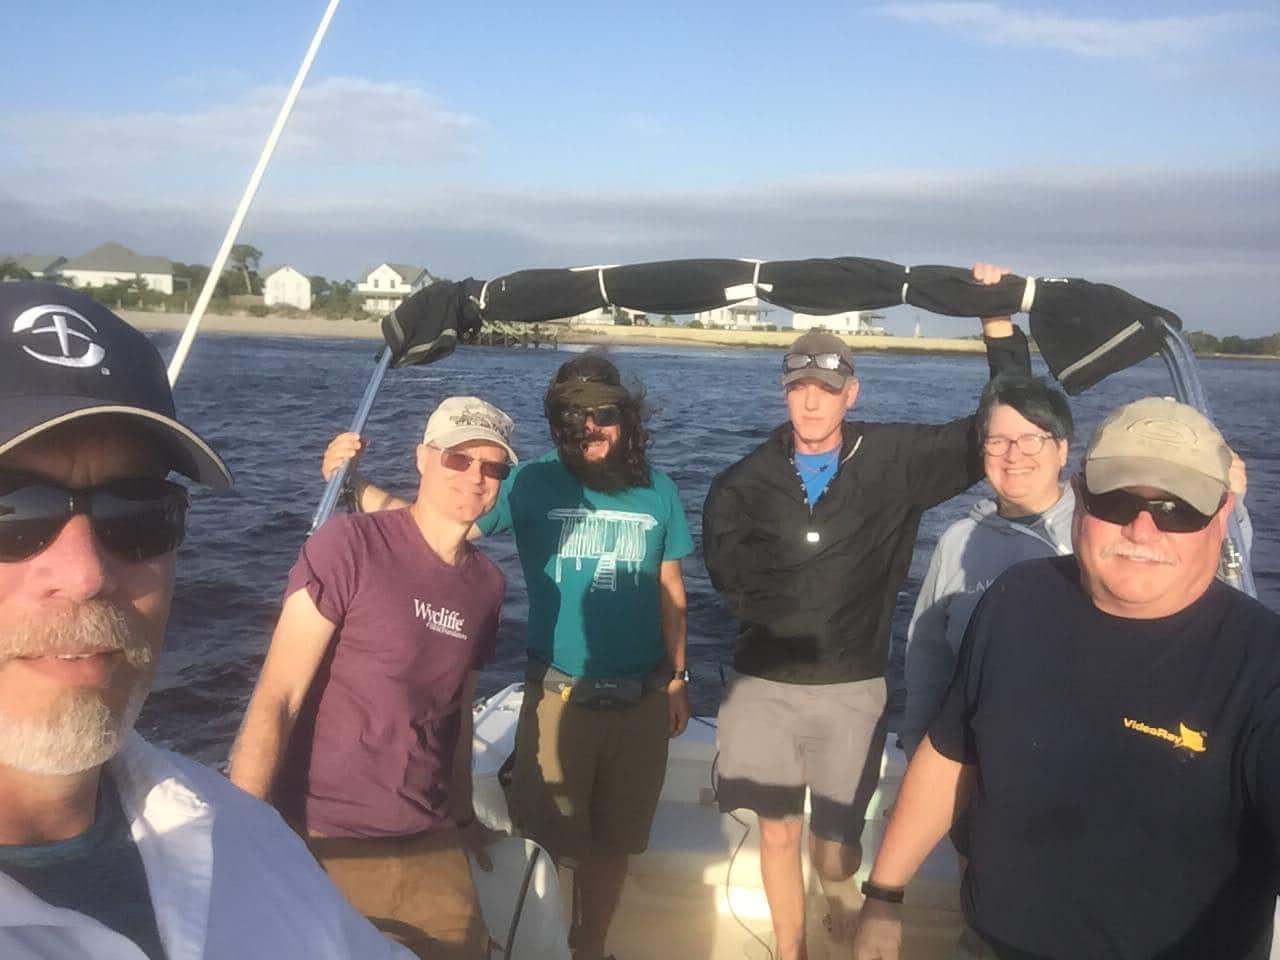 jaars crossventure coastal staff at lake wateree jd s on the far right jaars jaars